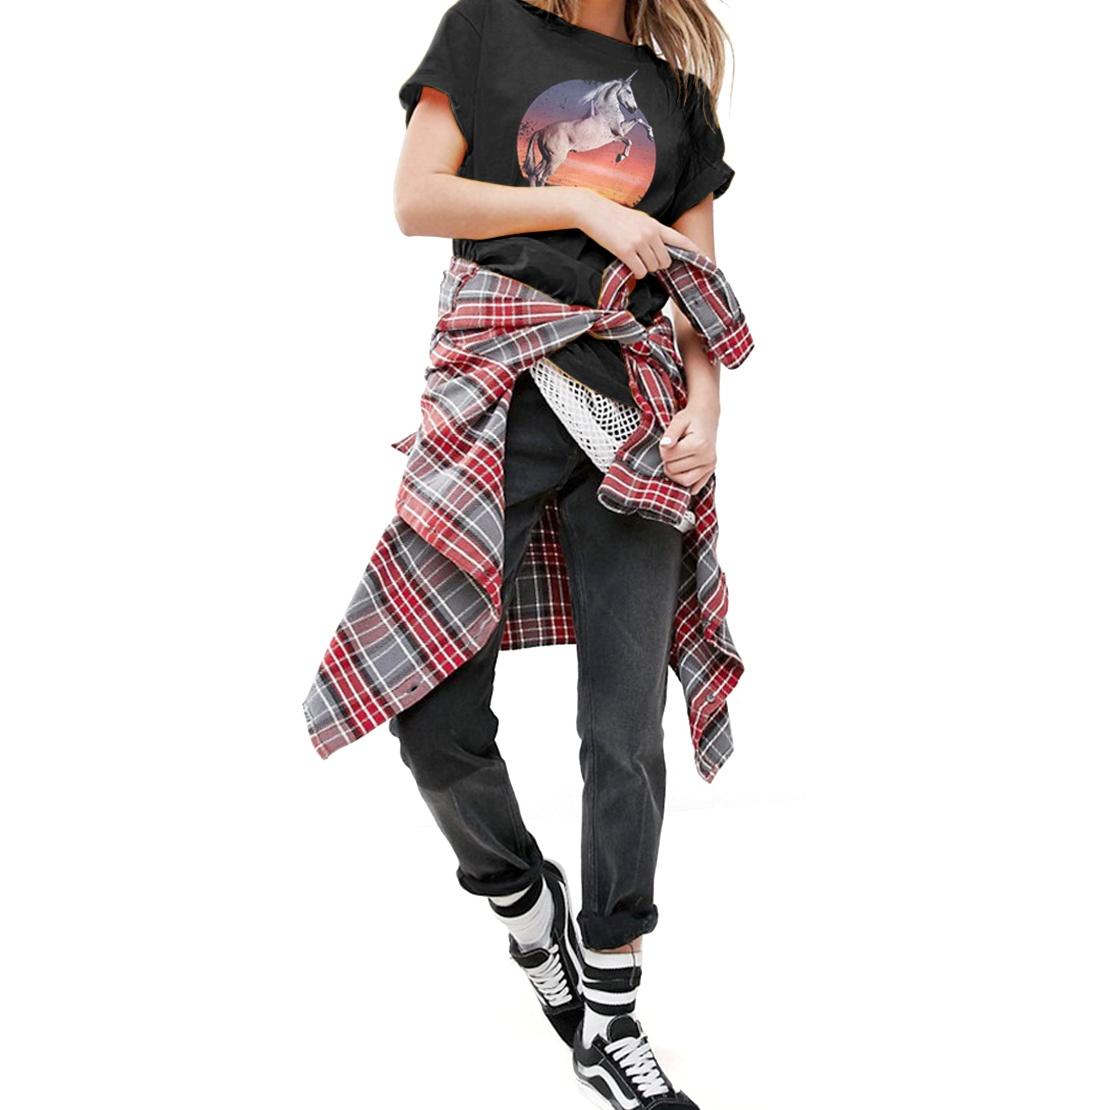 SR102 Fashionkilla Womens//Ladies Oversized Wild And Free Unicorn Print